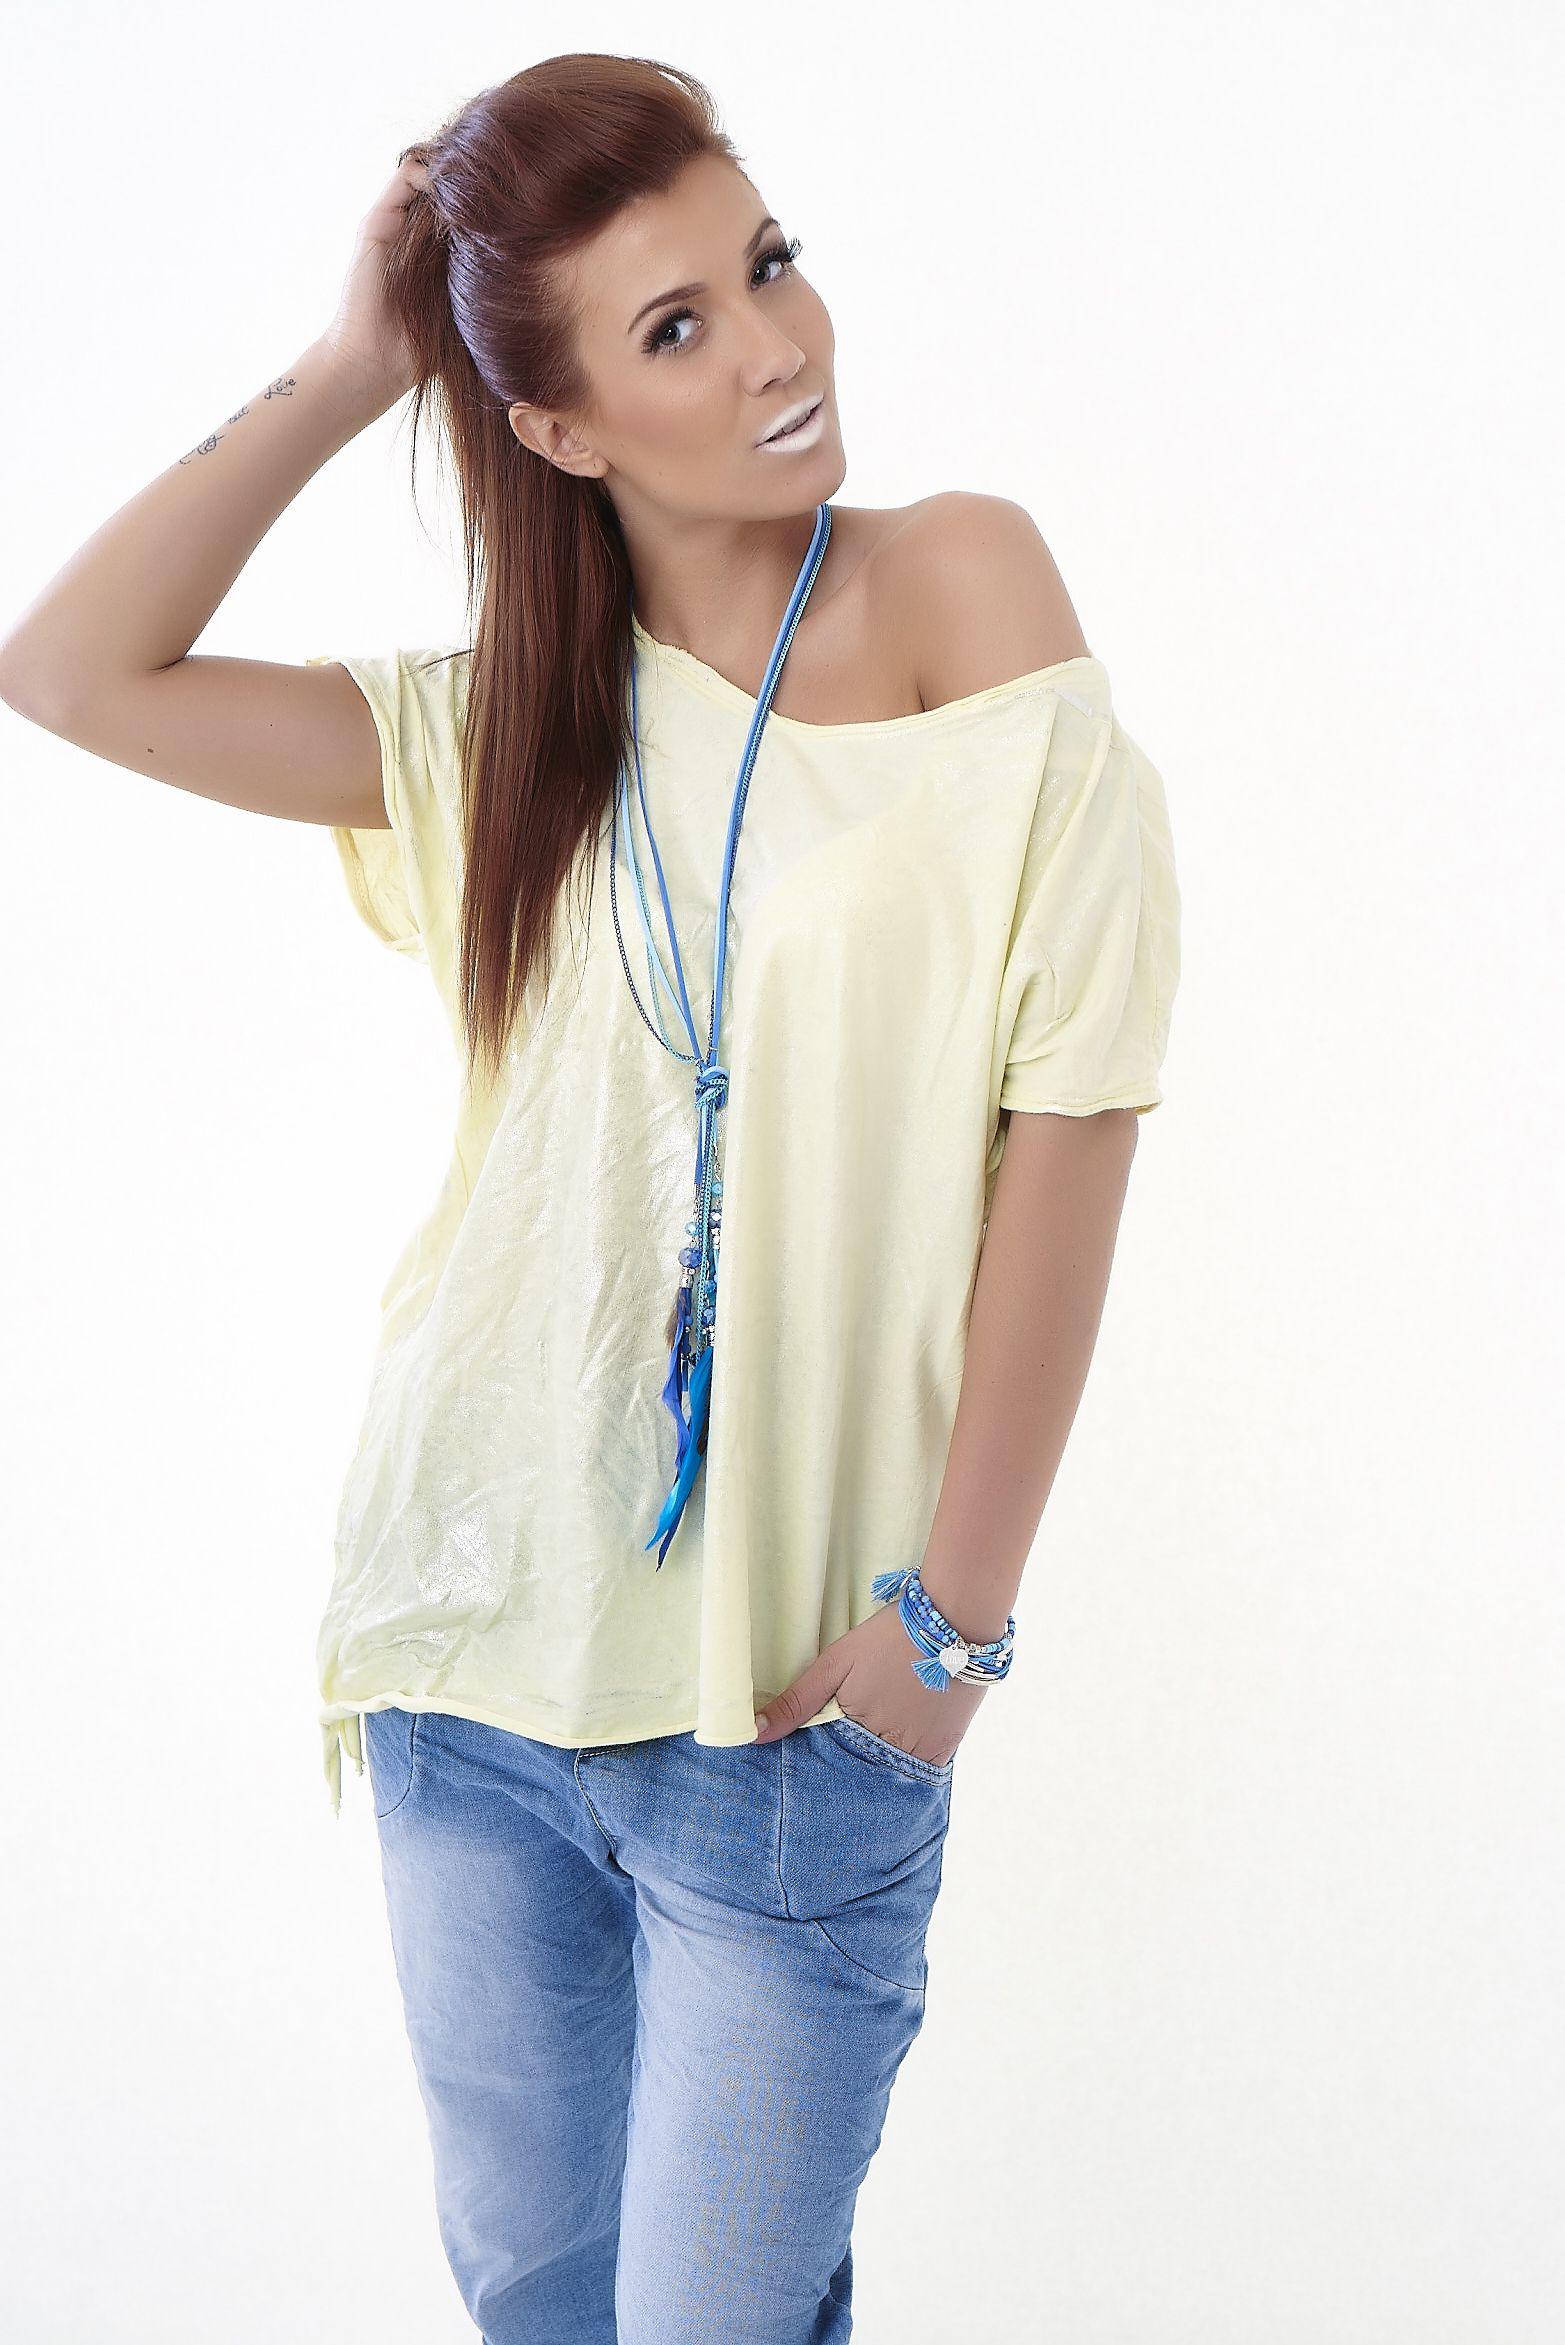 Eros Collection printemps/été 2015 #EROSCOLLECTION #PP15 #SS15 #style #fresh #spring #printemps #detail #jeans #top #style #belle #rebelle #rock #love #quote #colors #jaune #yellow #totallook